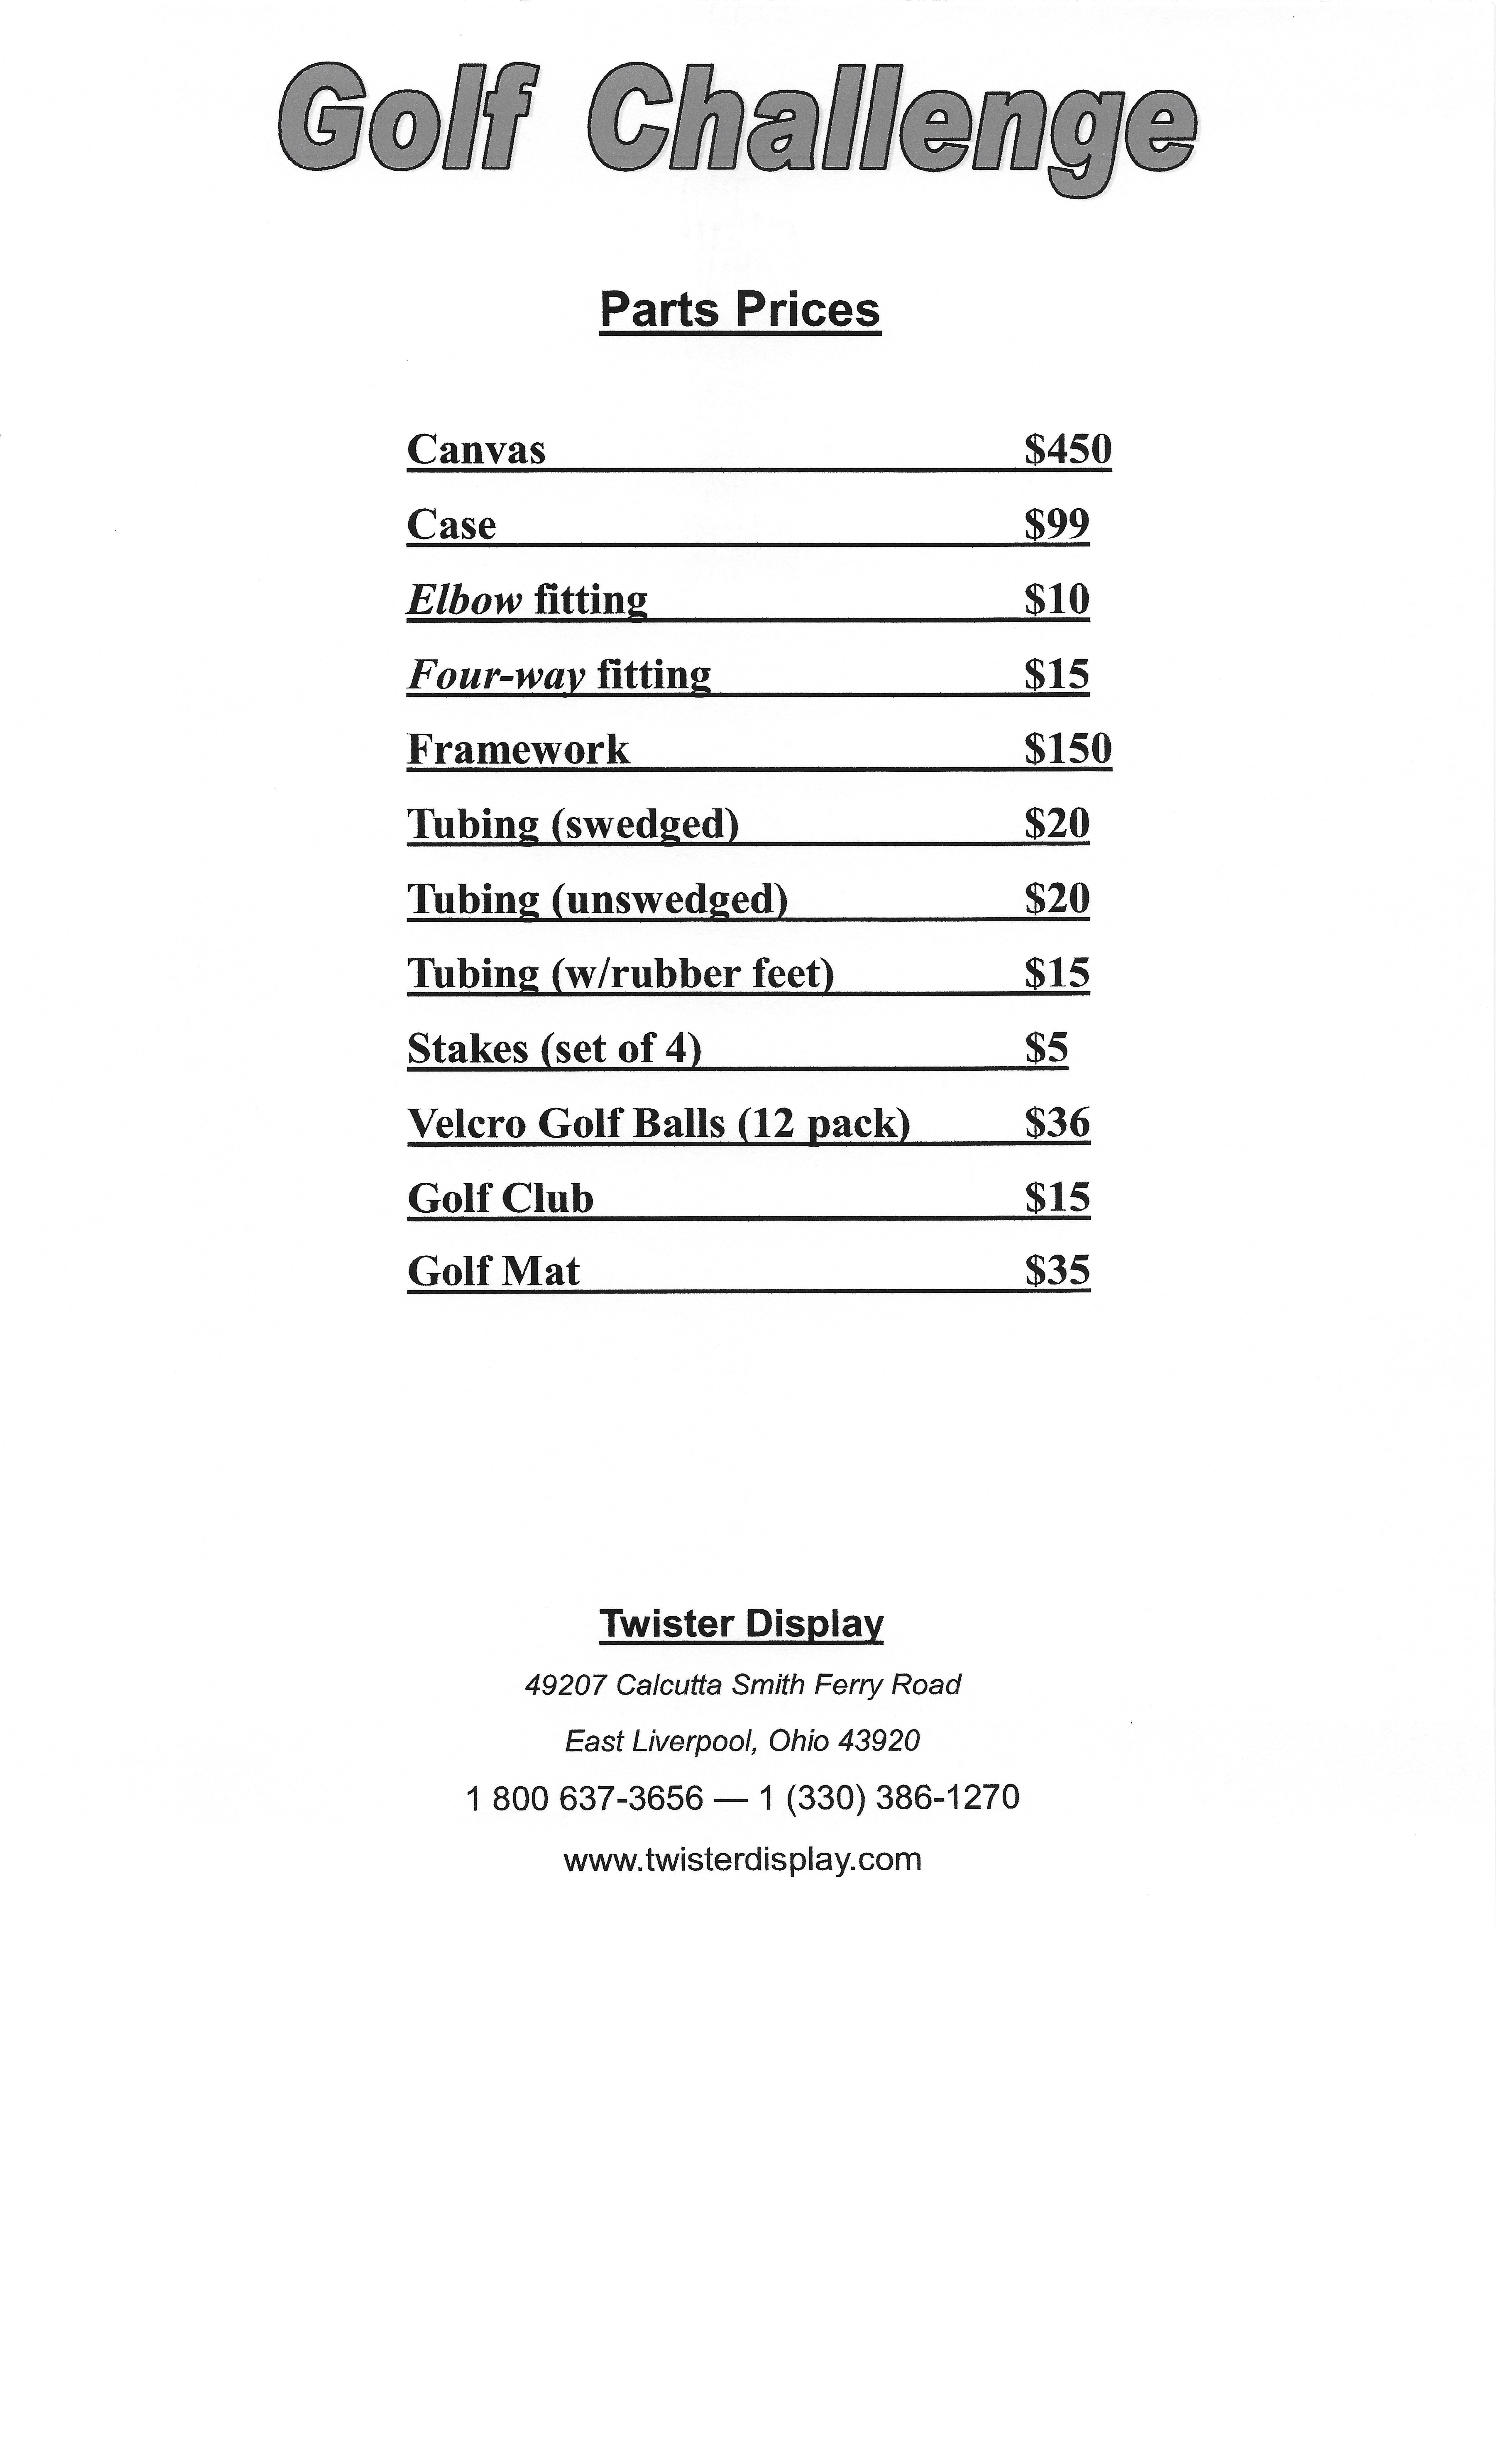 golf-chipping-challenge-instructions0005.jpg